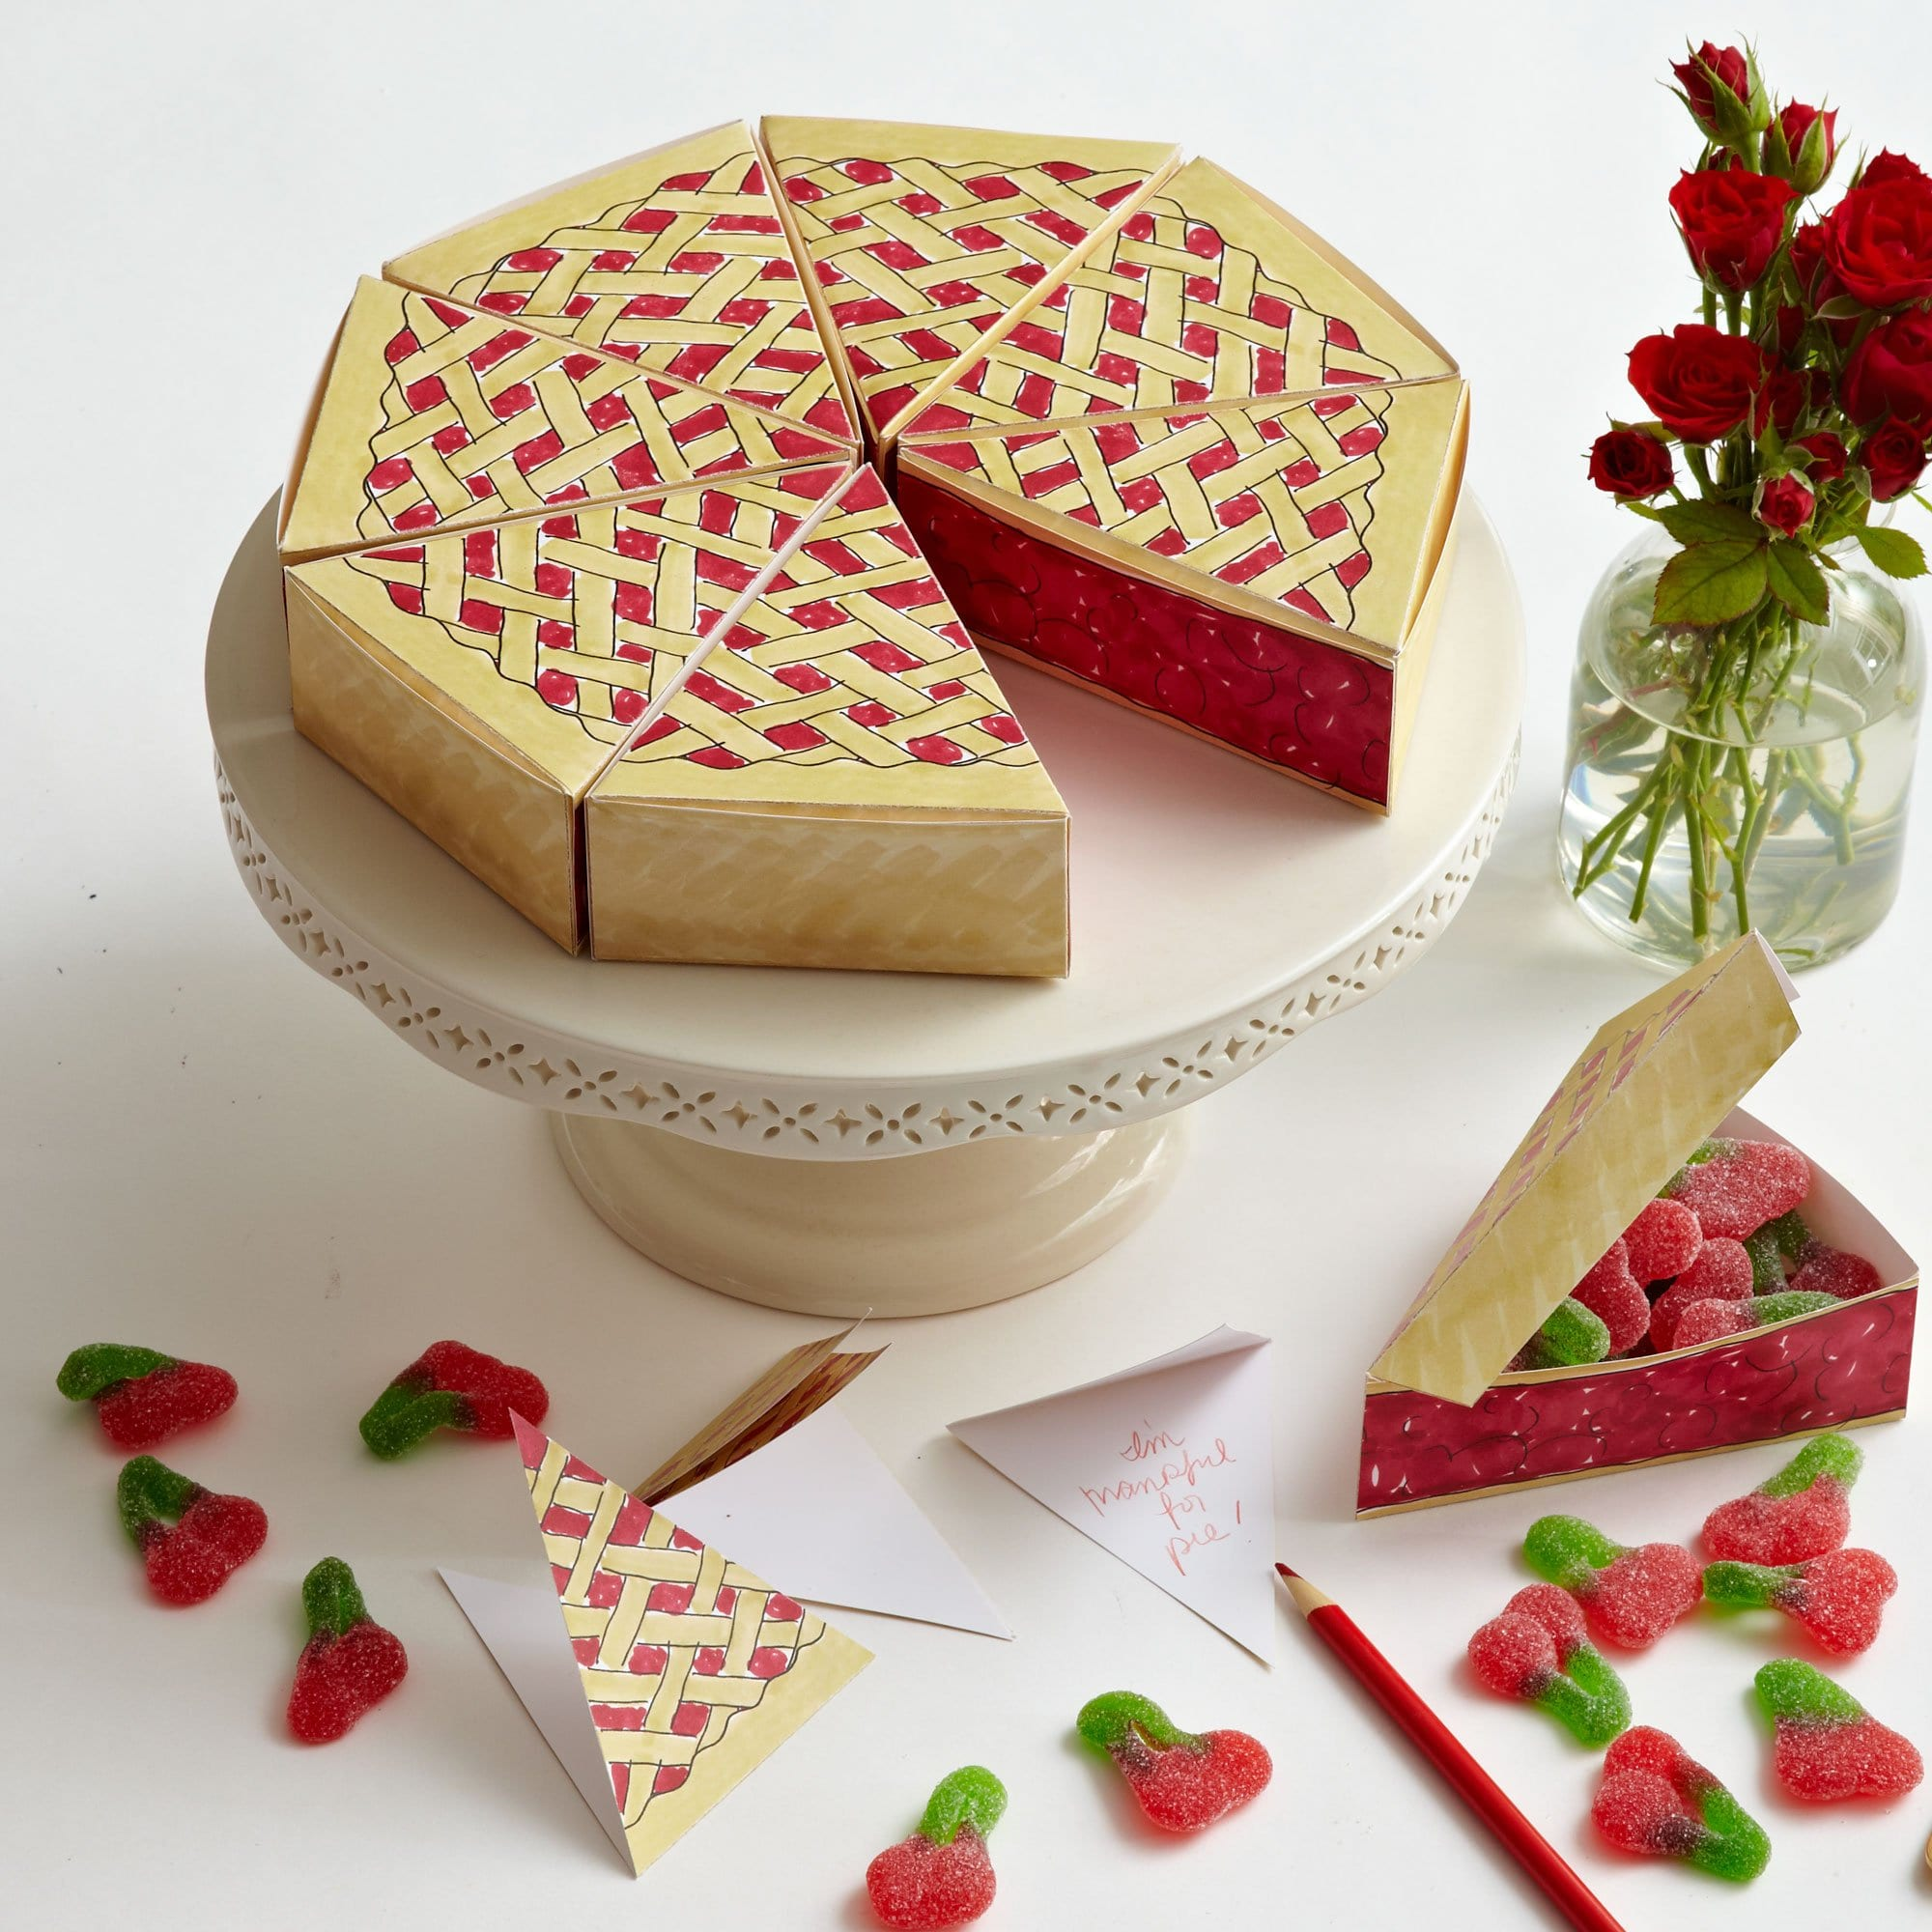 Darcy Miller Designs Paper Pie Box Favors Thanksgiving, Pie, Favor, DIY Box, Pumpkin Pie, Cherry Pie, Paper Craft, Downloadable Template, Party Favor